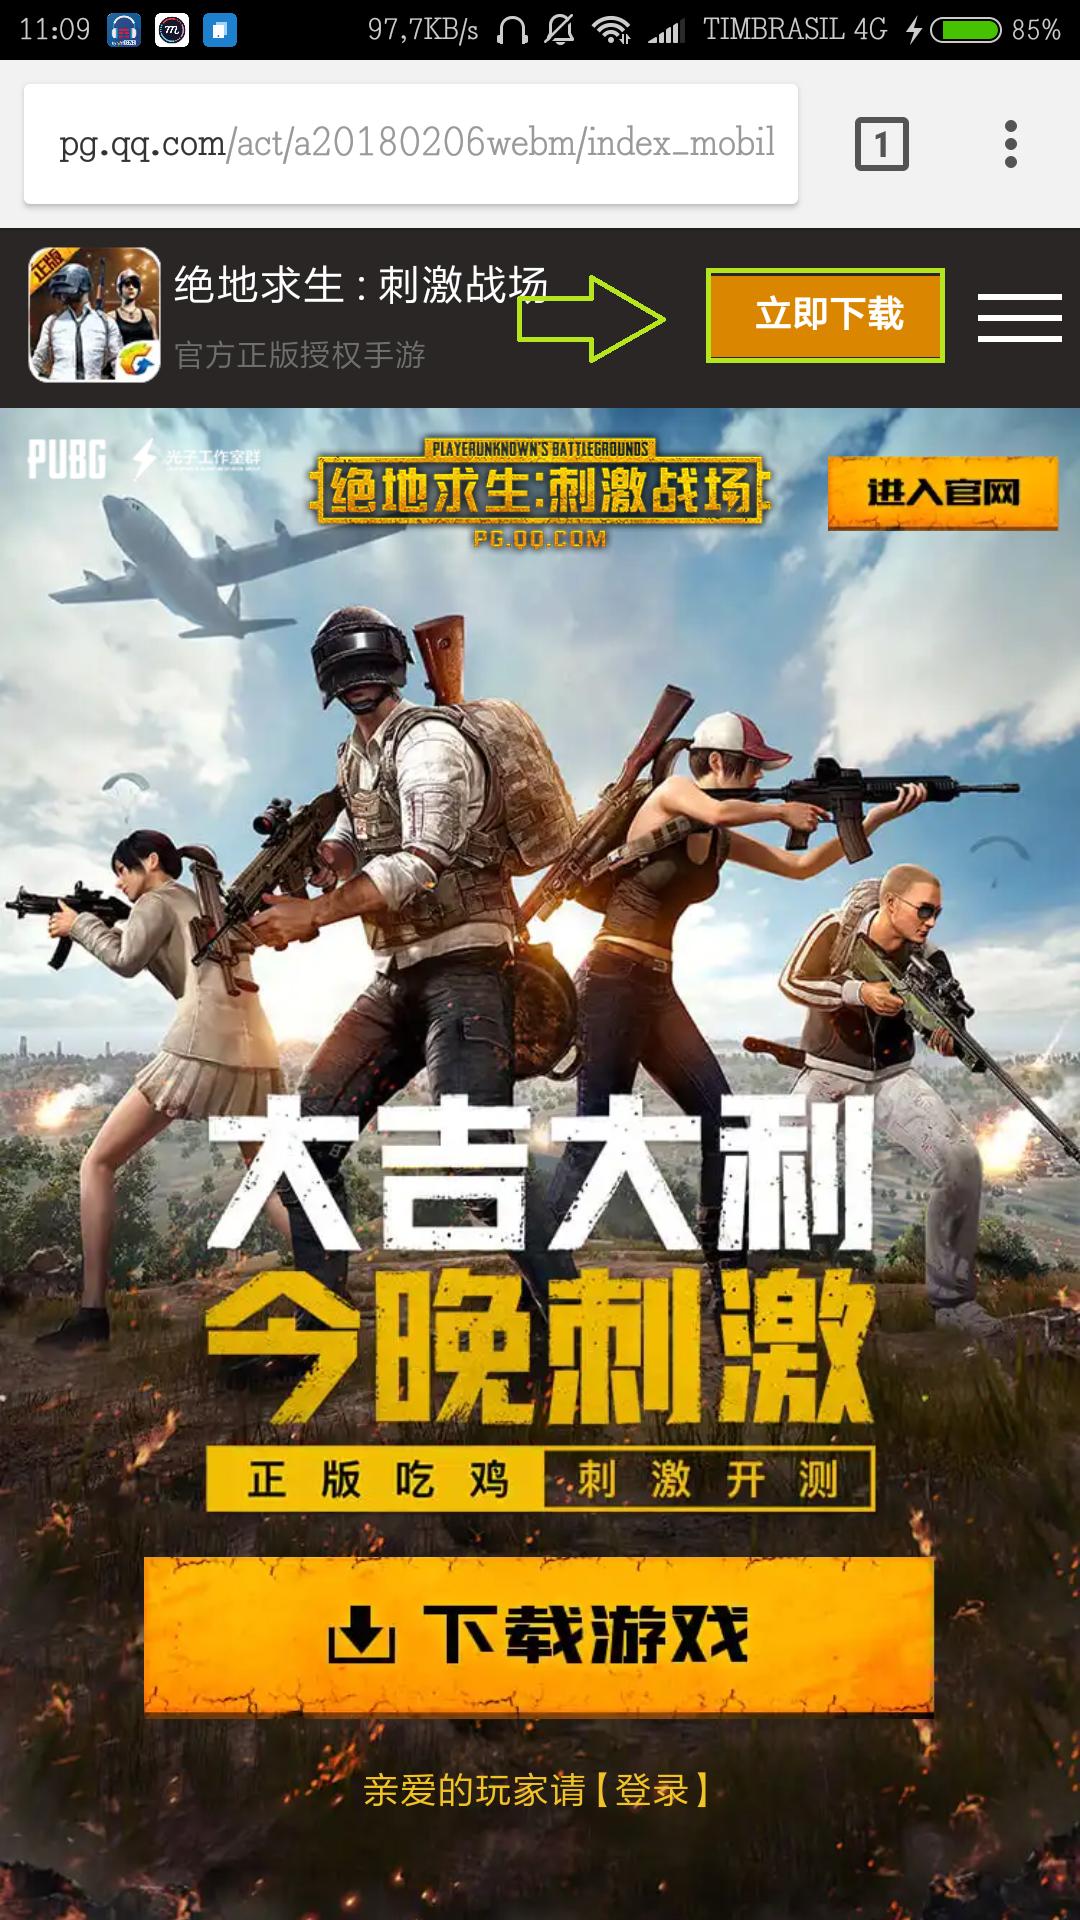 Playerunknown's Battlegrounds Battlefield